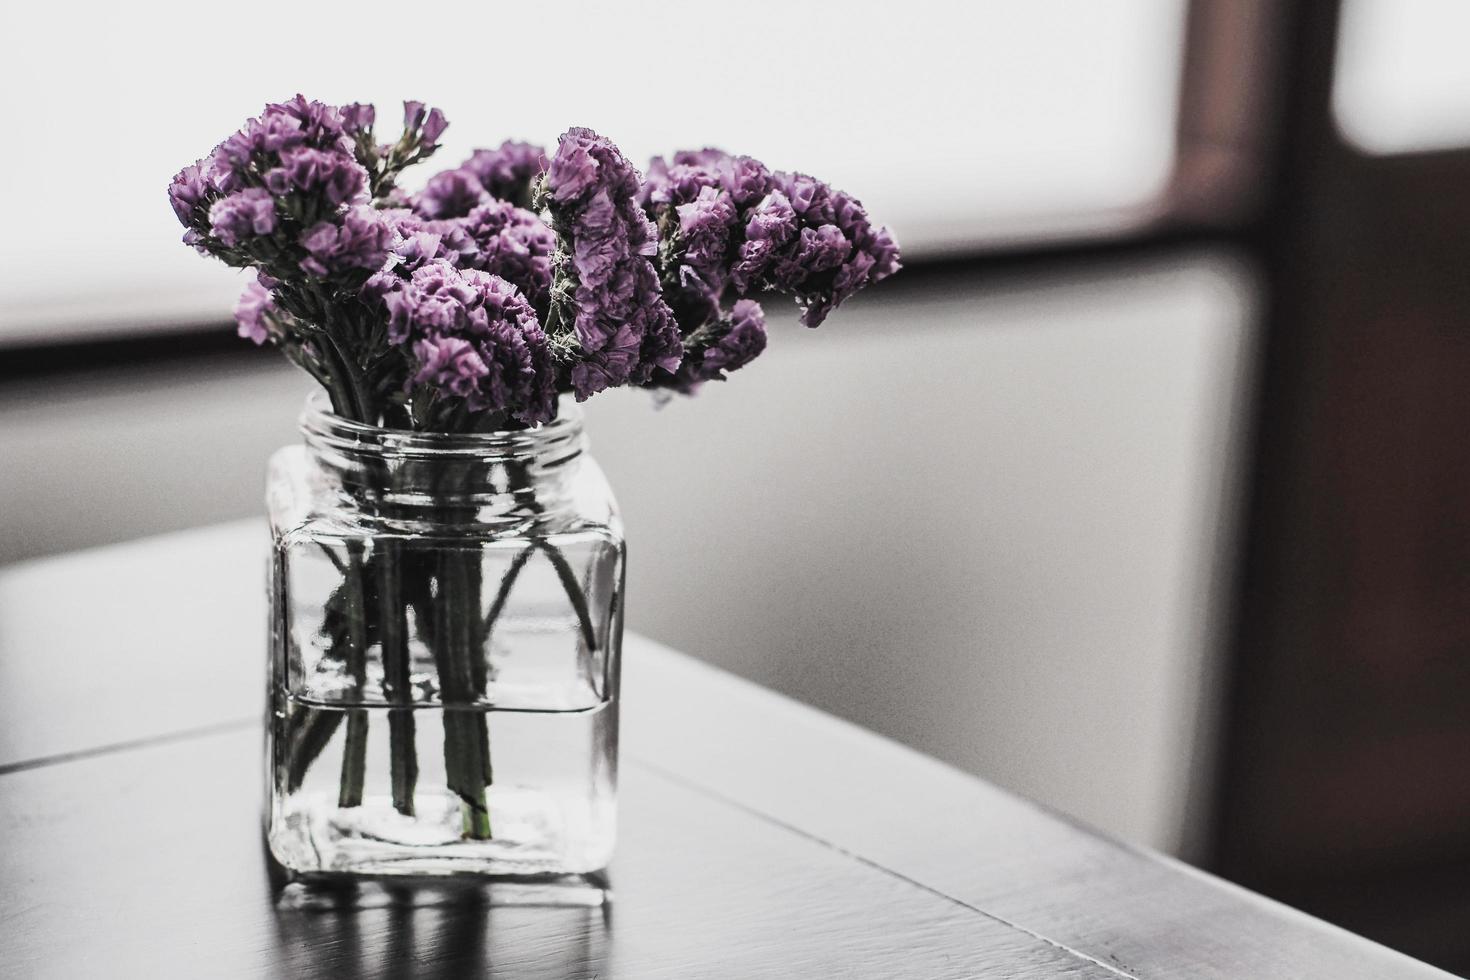 Violet flowers in glass vase photo